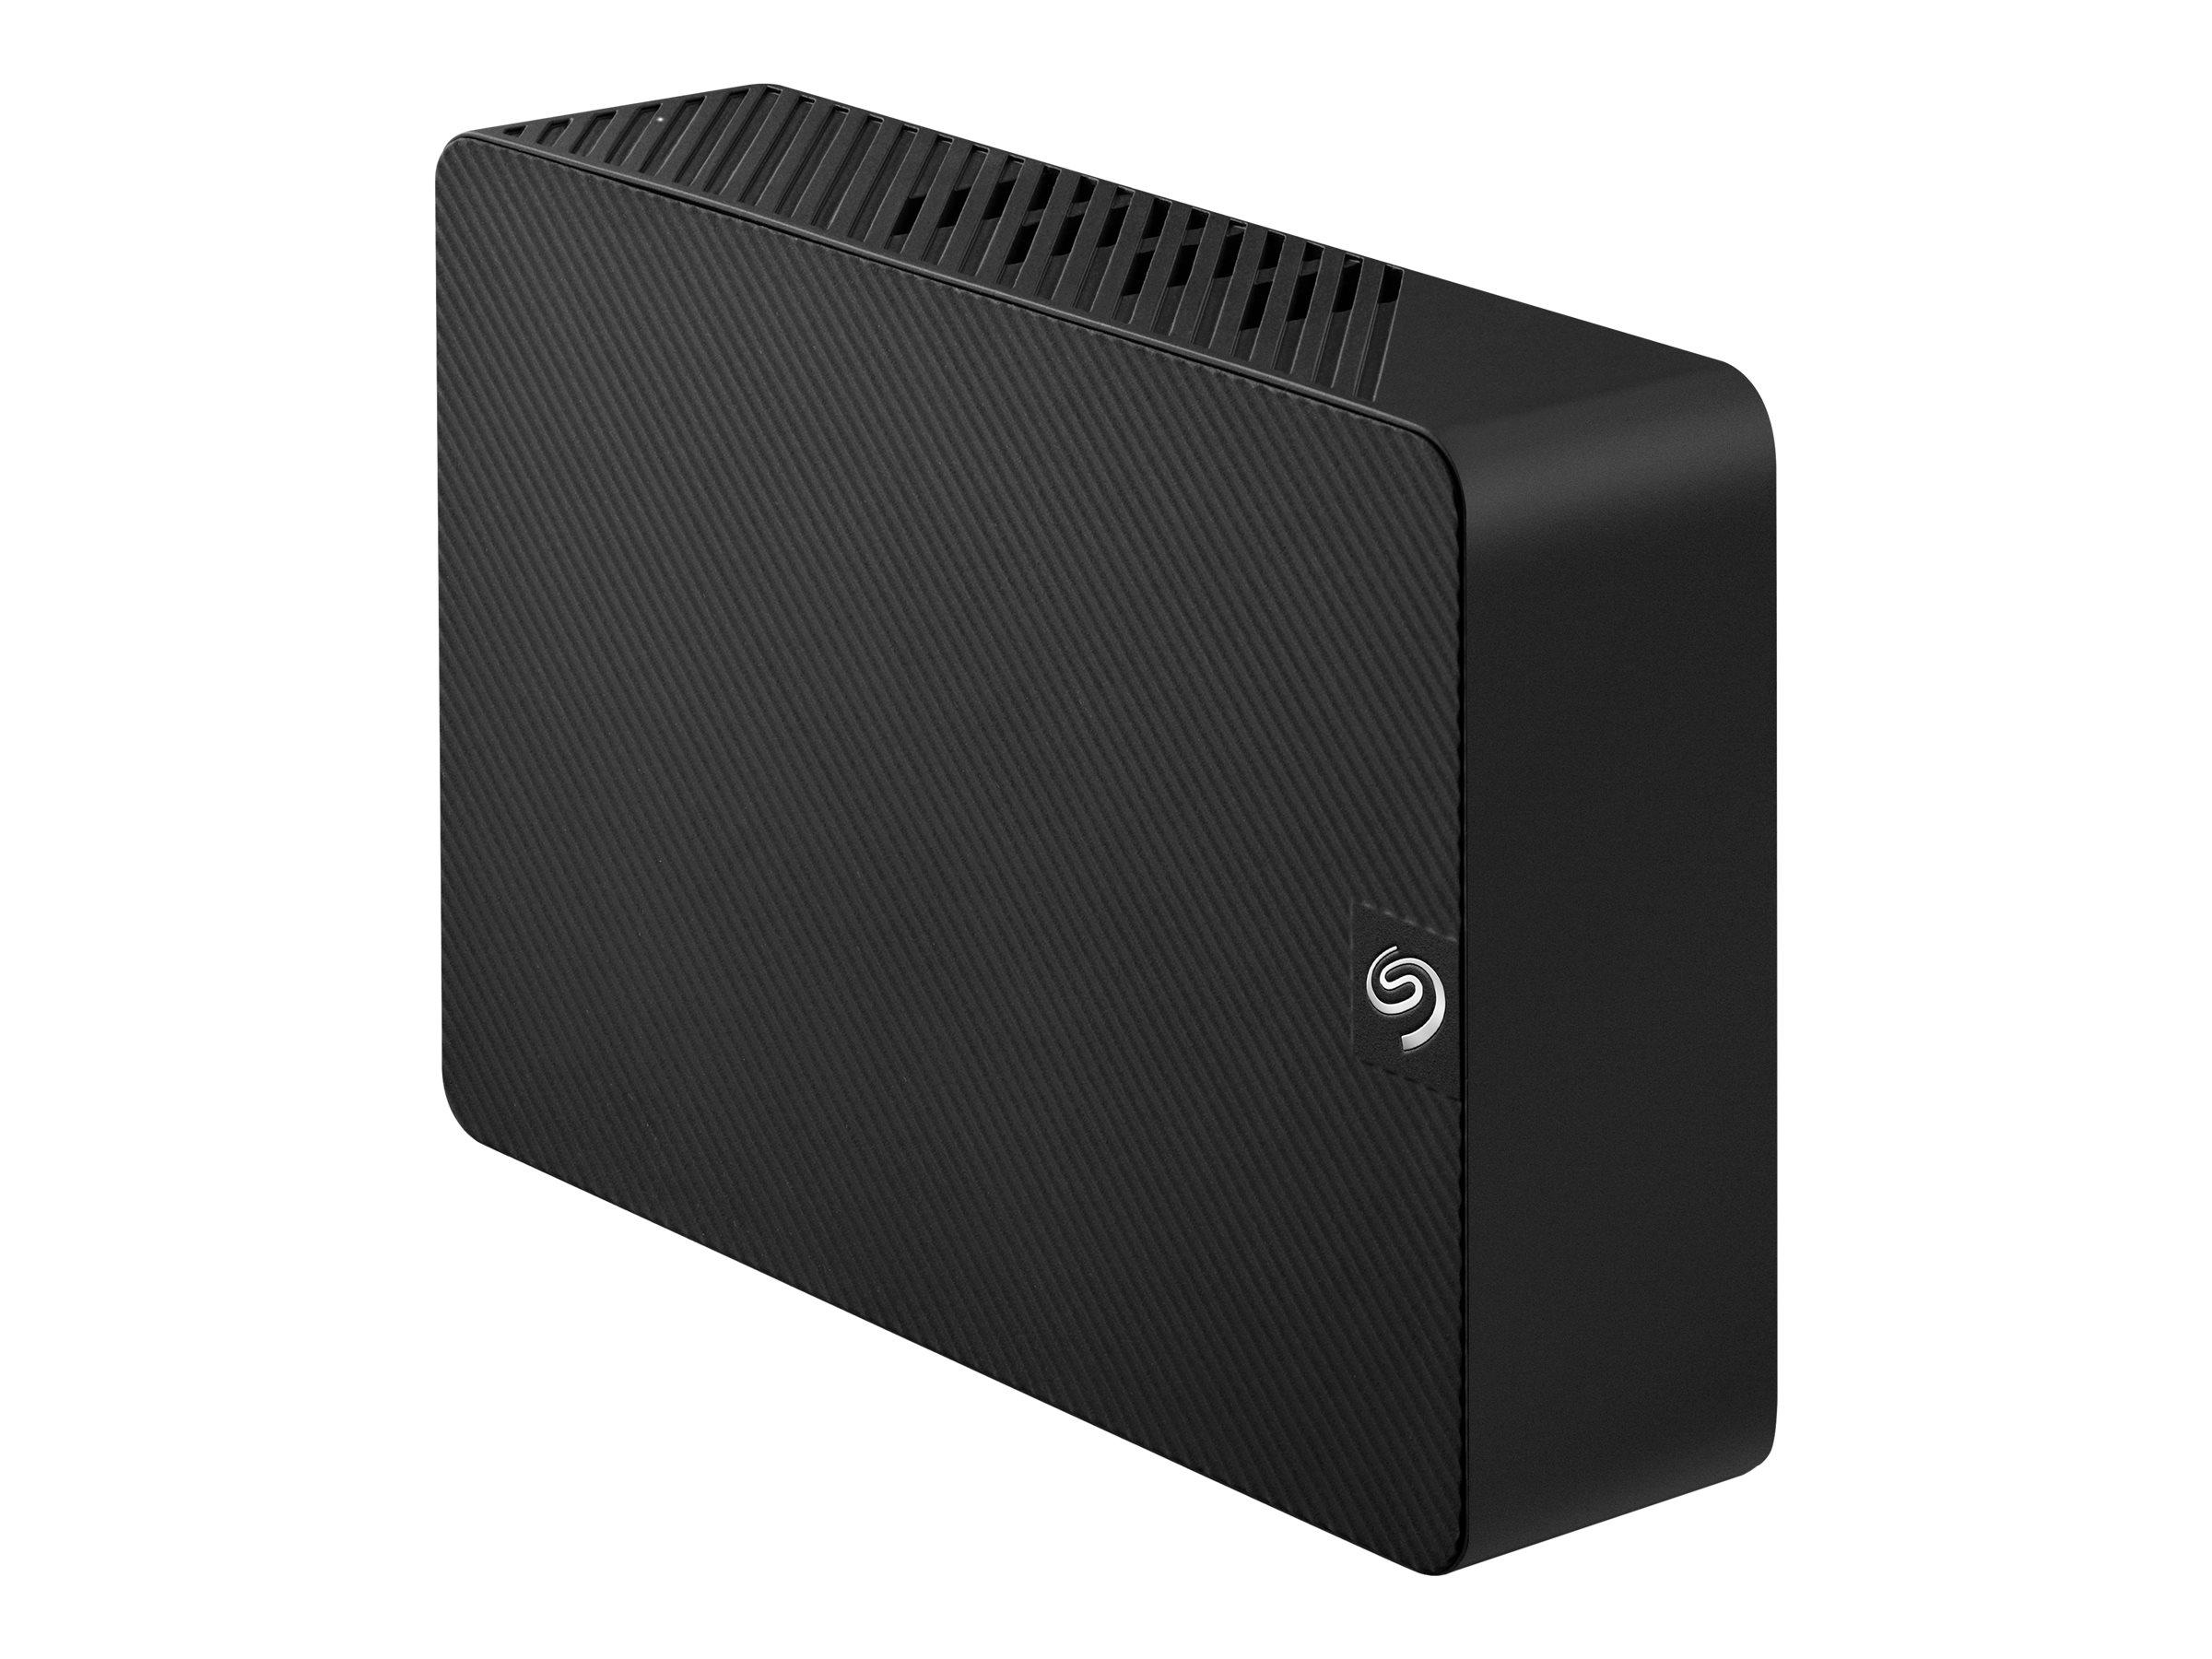 Seagate Expansion STKP10000400 - Festplatte - 10 TB - extern (Stationär) - USB 3.0 - Schwarz